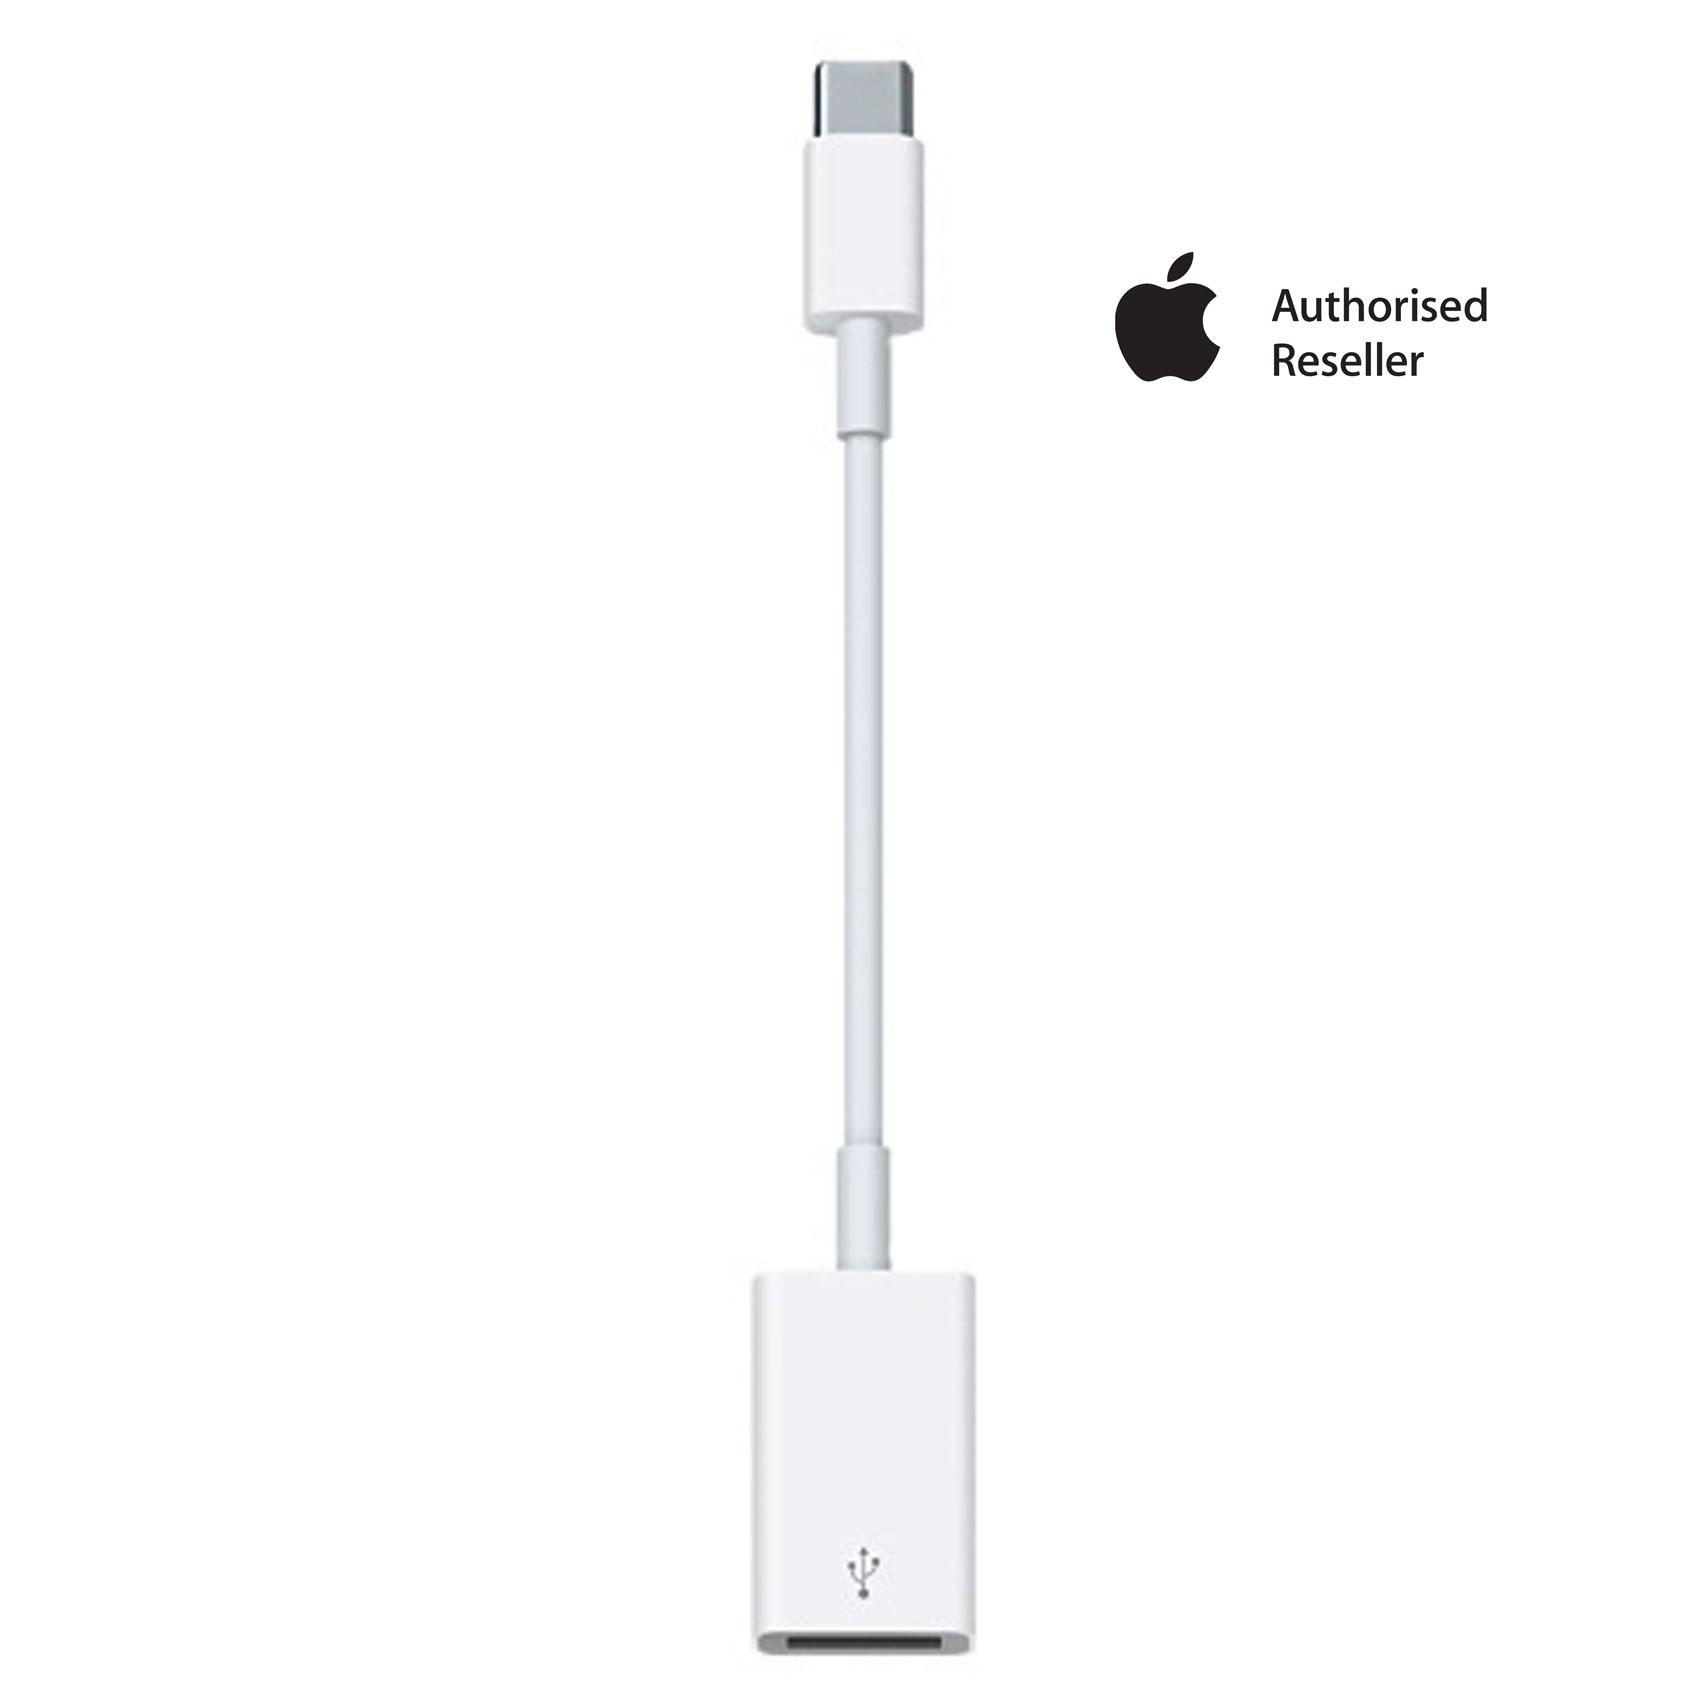 APPLE ADAPTER USB-C TO USB